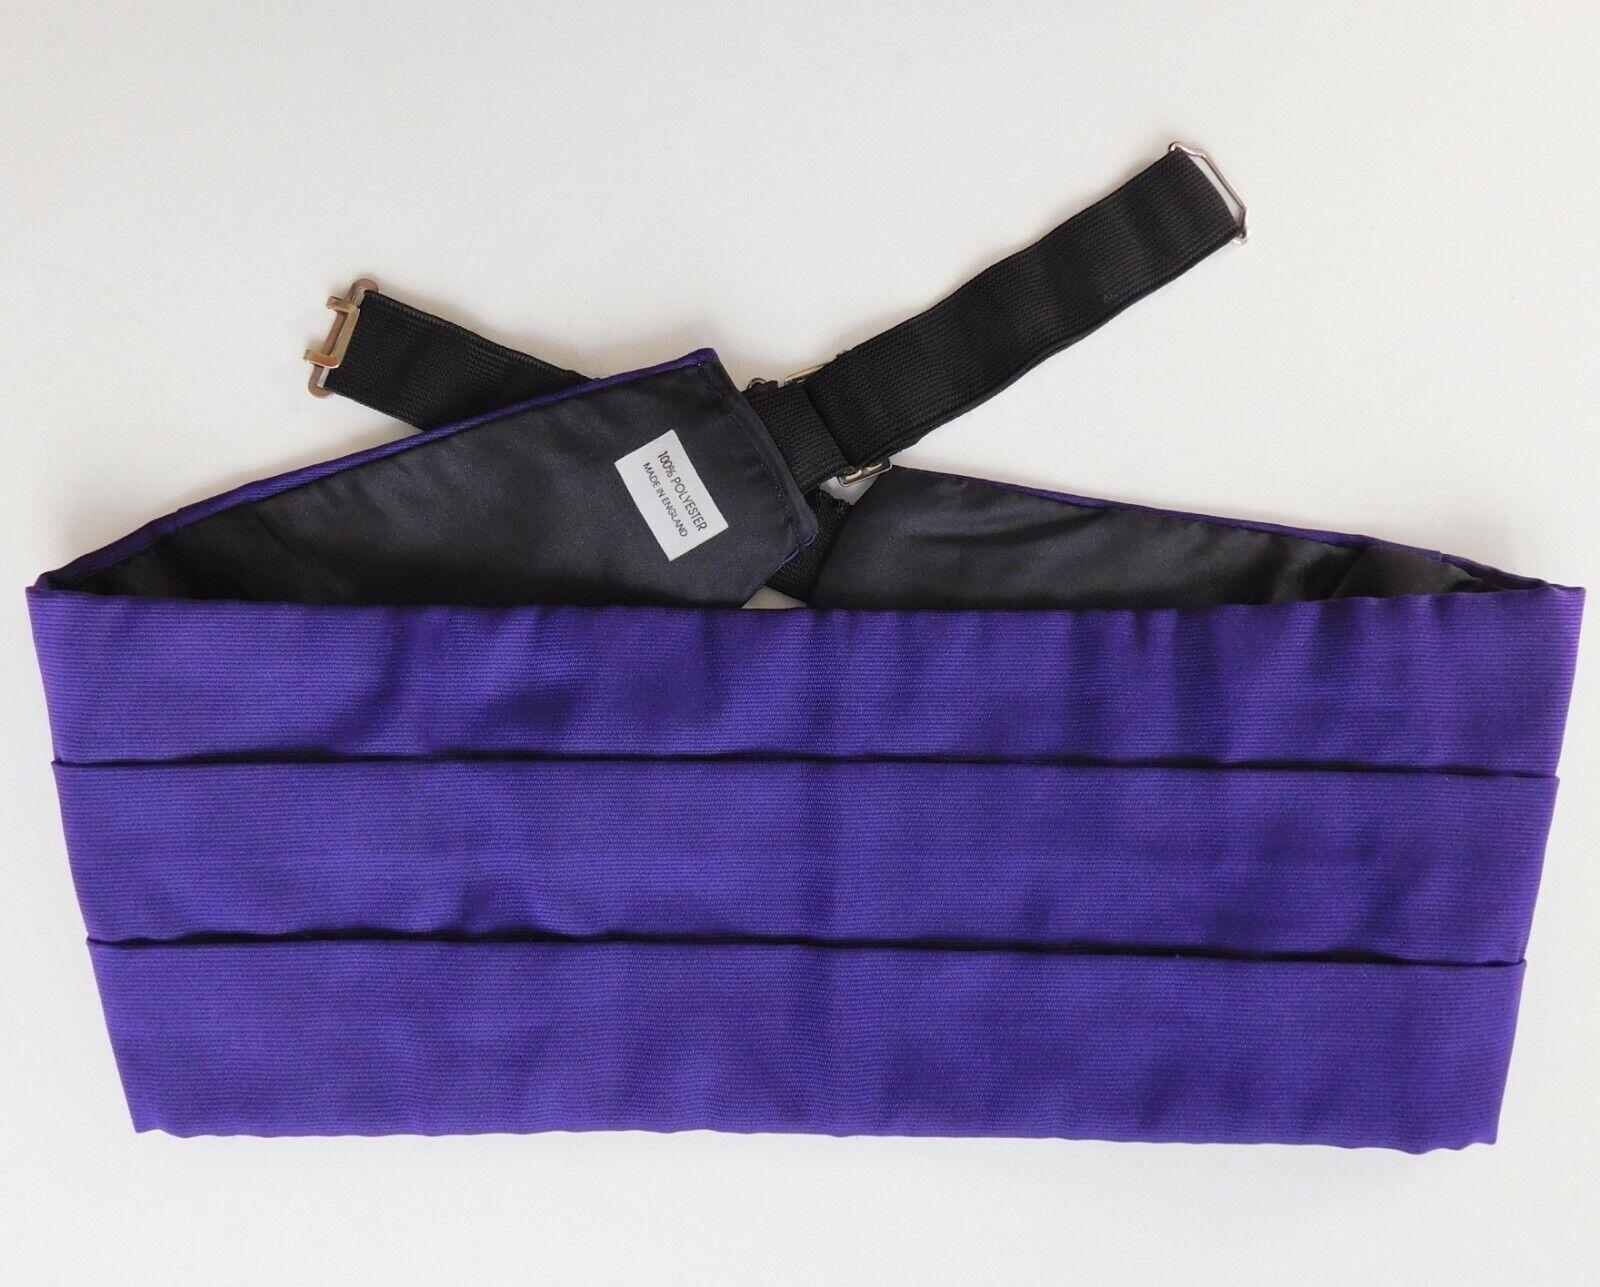 Mans purple cummerbund tuxedo formal evening dress wear made in England